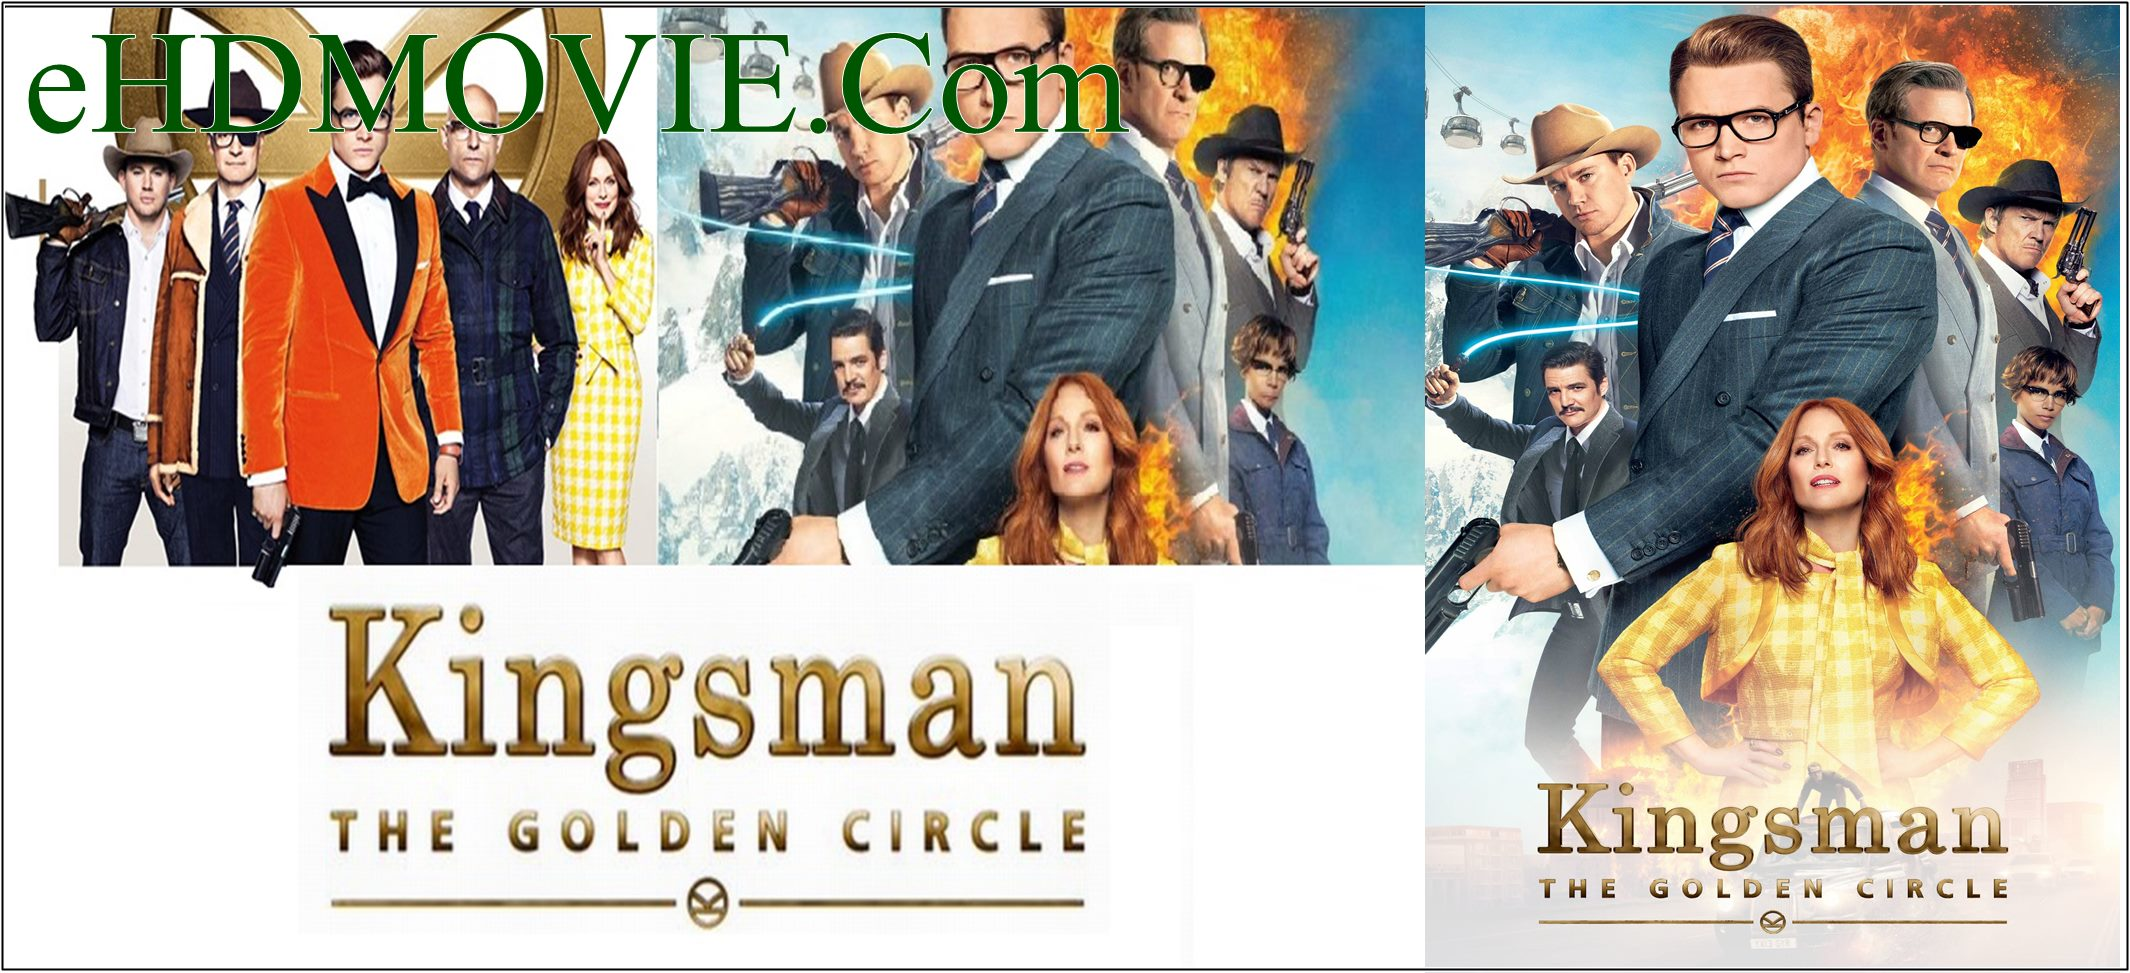 Kingsman The Golden Circle 2017 Full Movie Dual Audio [Hindi – English] 720p – 480p ORG BRRip 450MB – 1.2GB ESubs Free Download